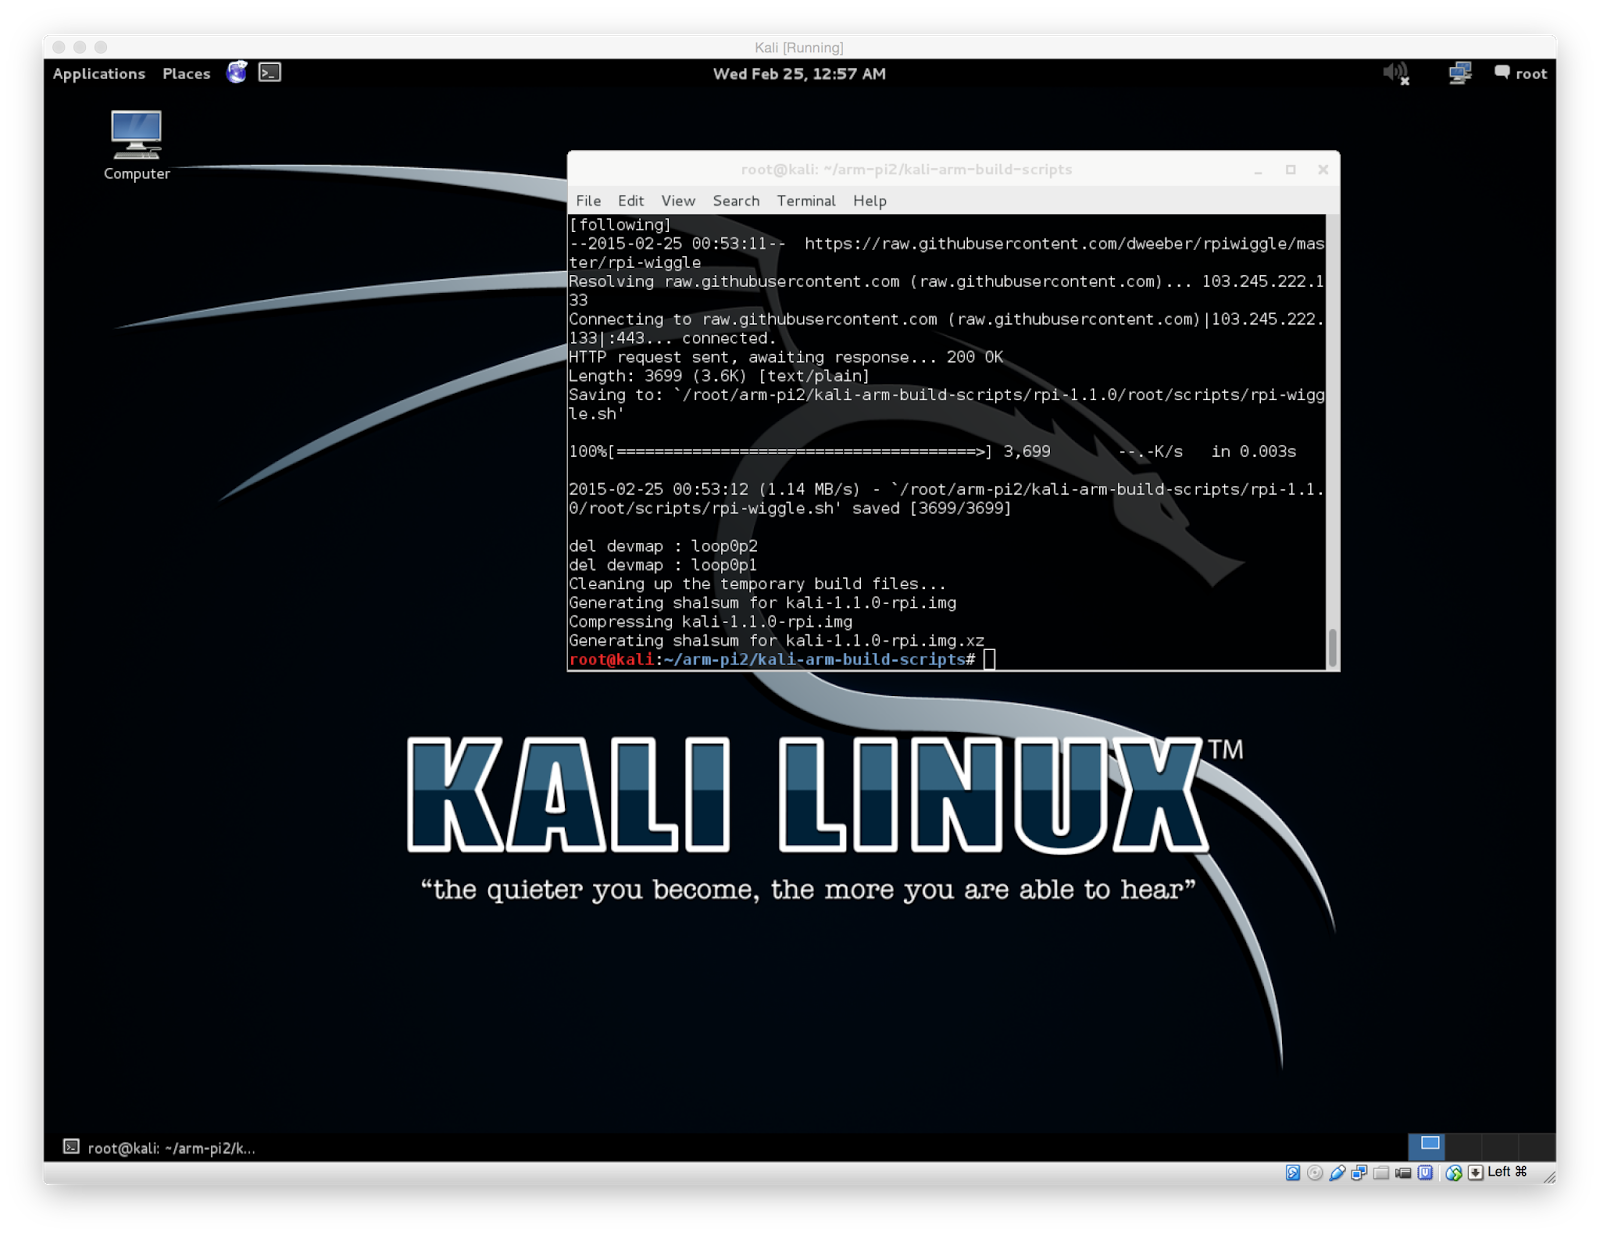 Download kali linux for raspberry pi 3 model b